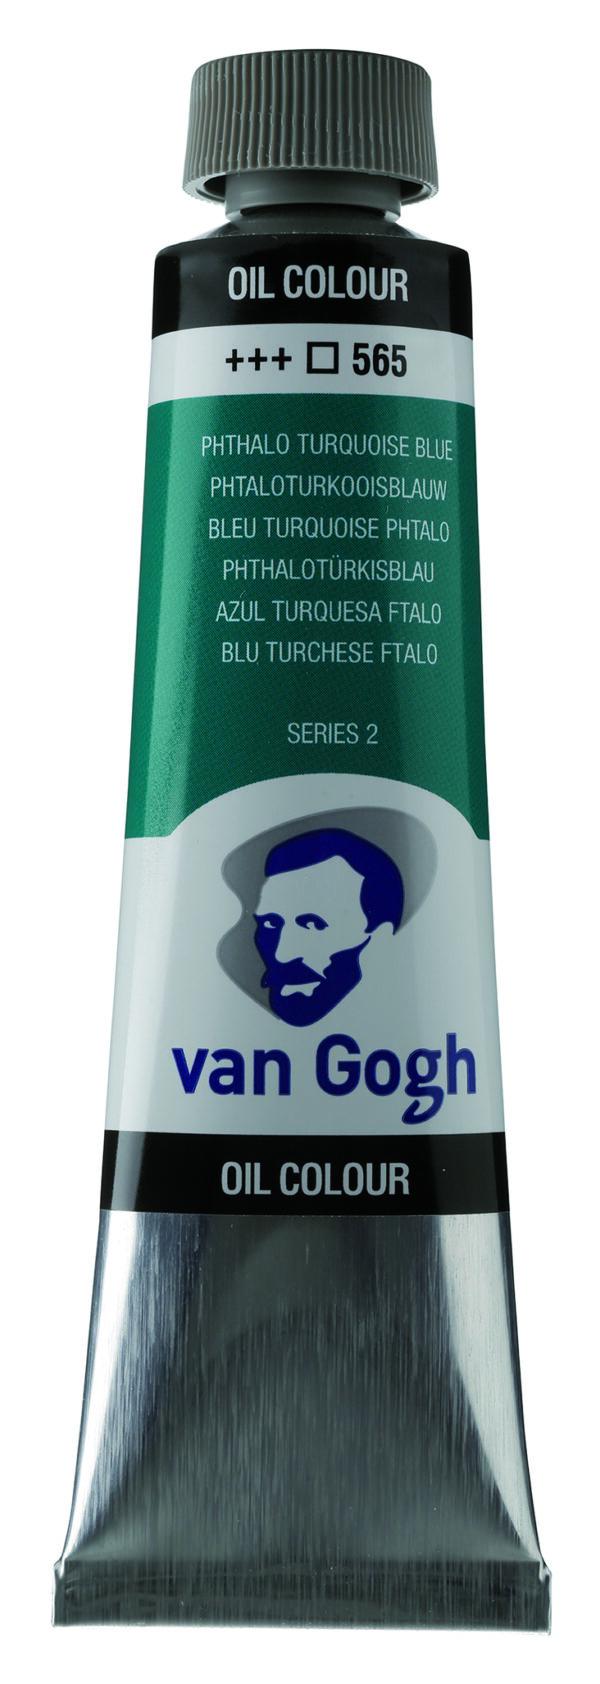 Van Gogh 565 Phthalo turquoise blue - 40 ml